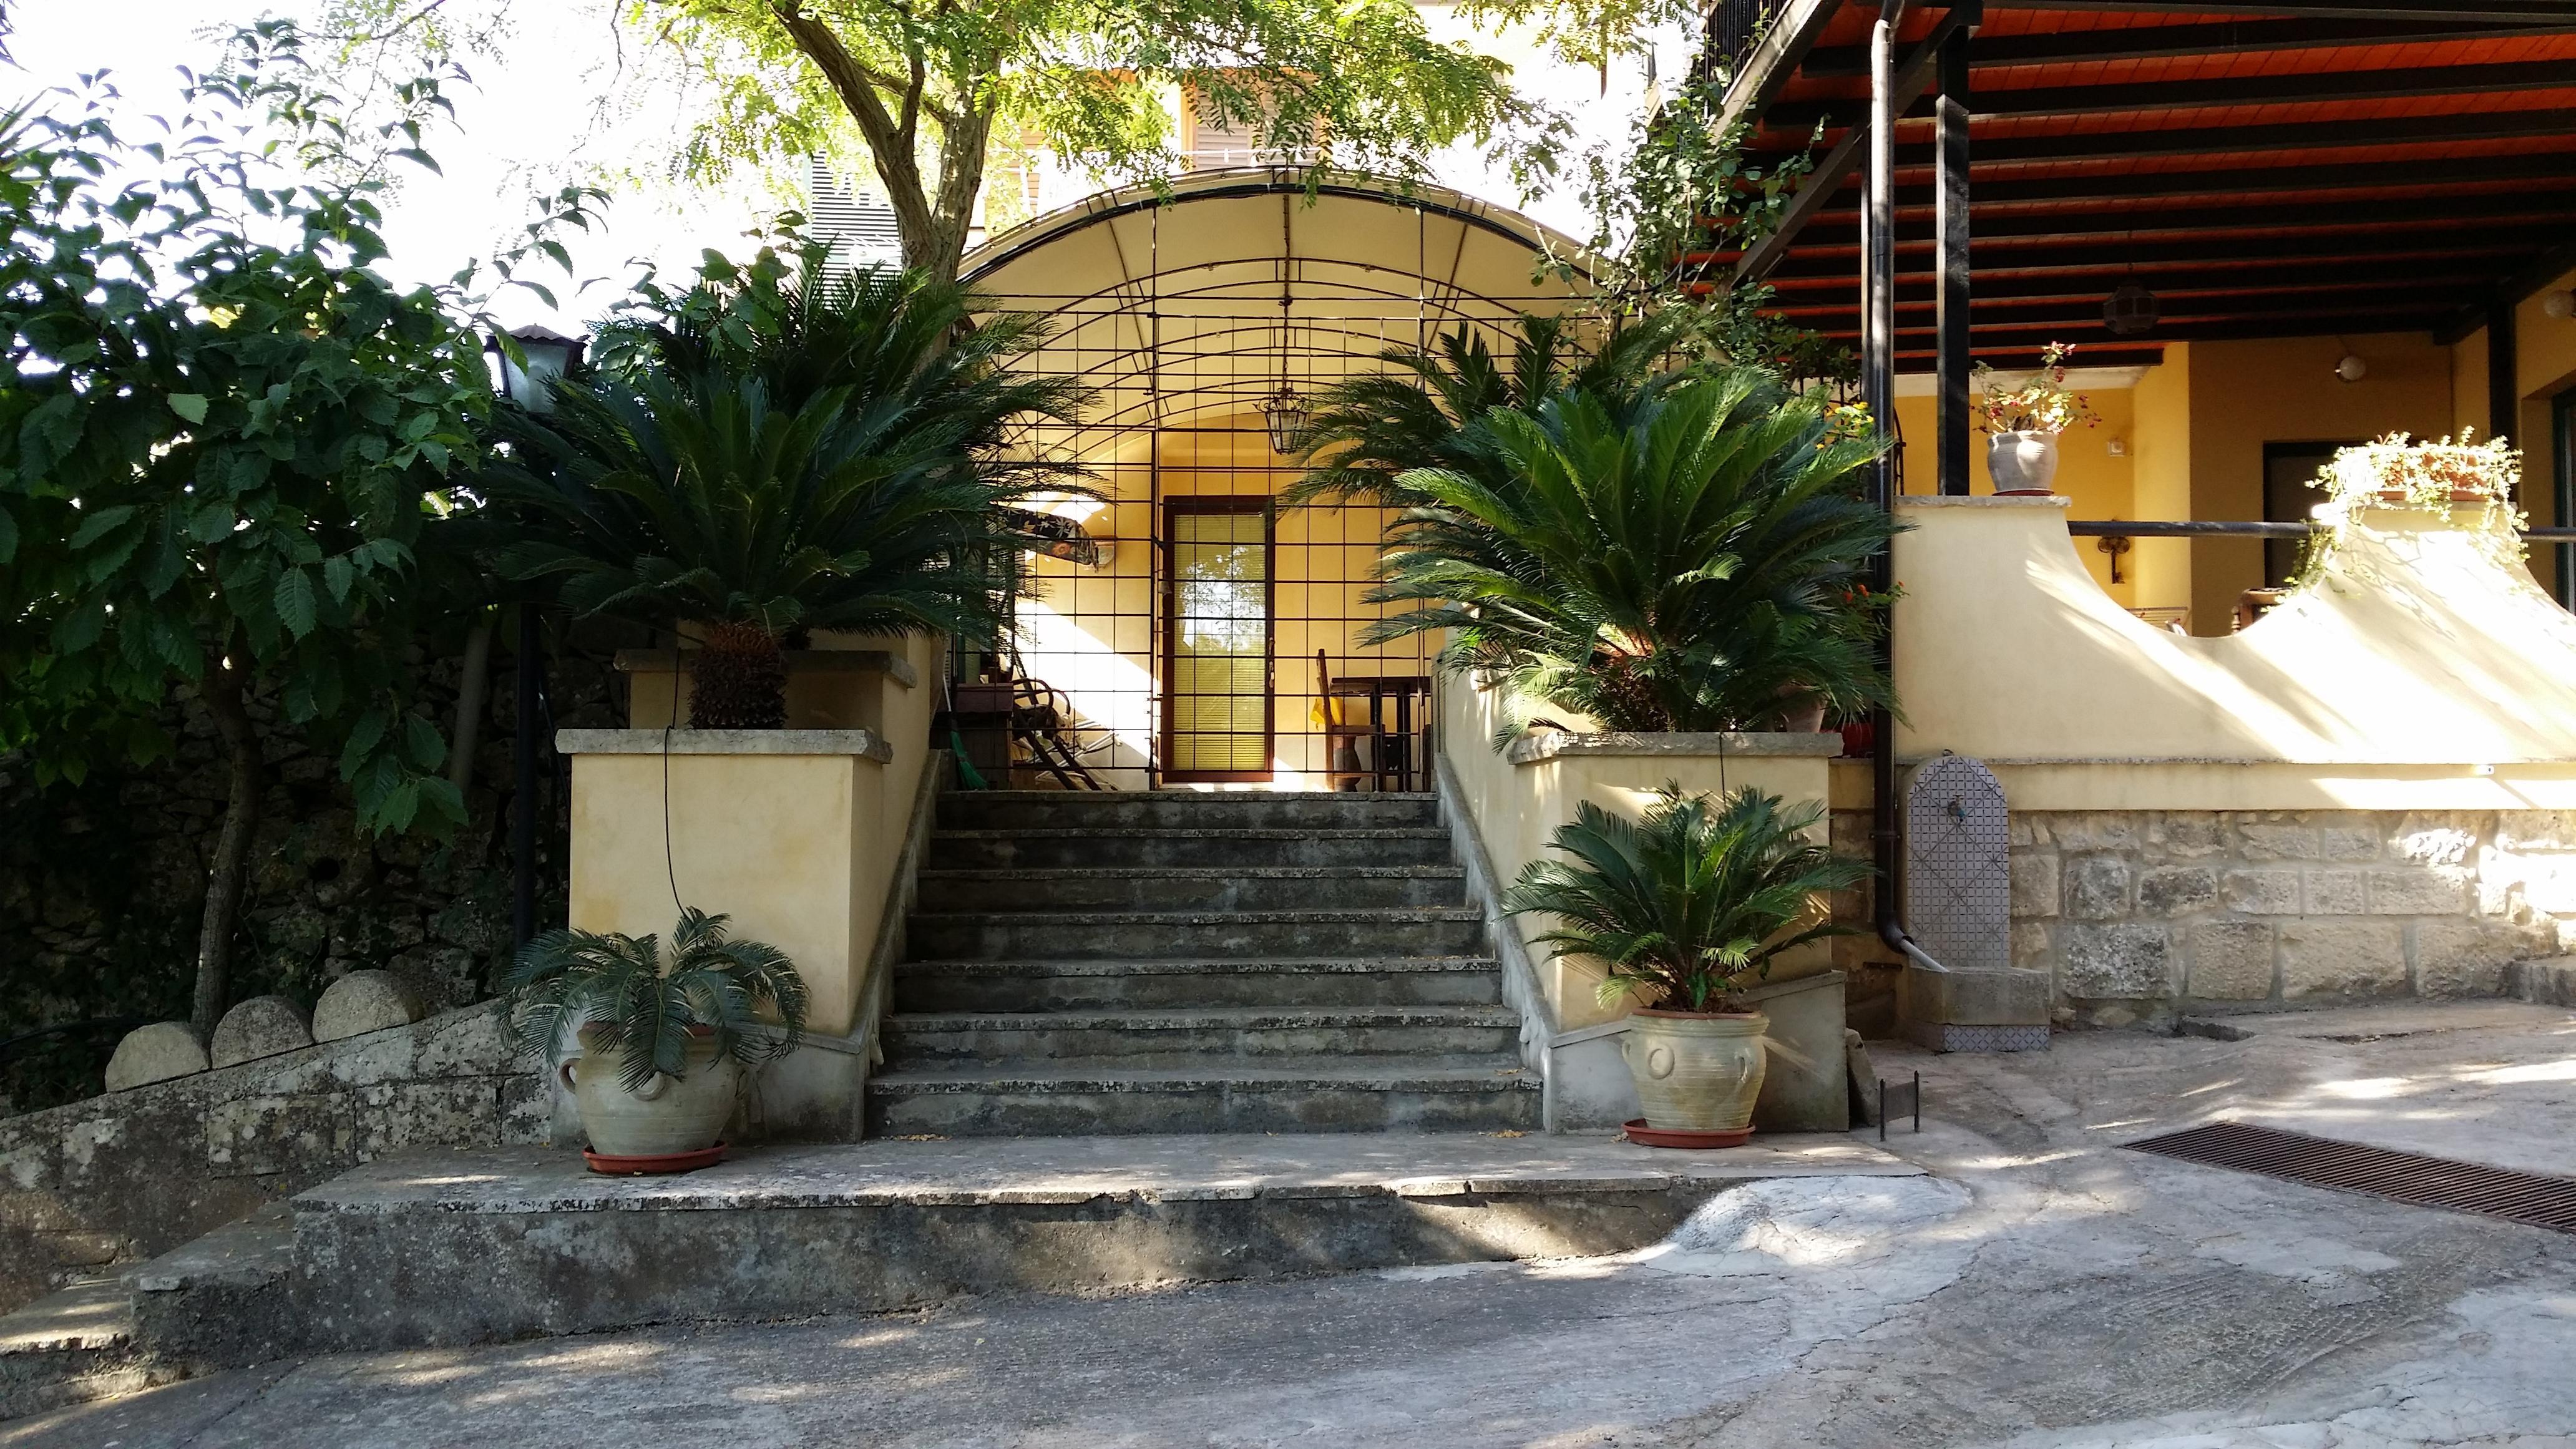 Appartement de vacances Bellavista (1730194), Modica, Ragusa, Sicile, Italie, image 25